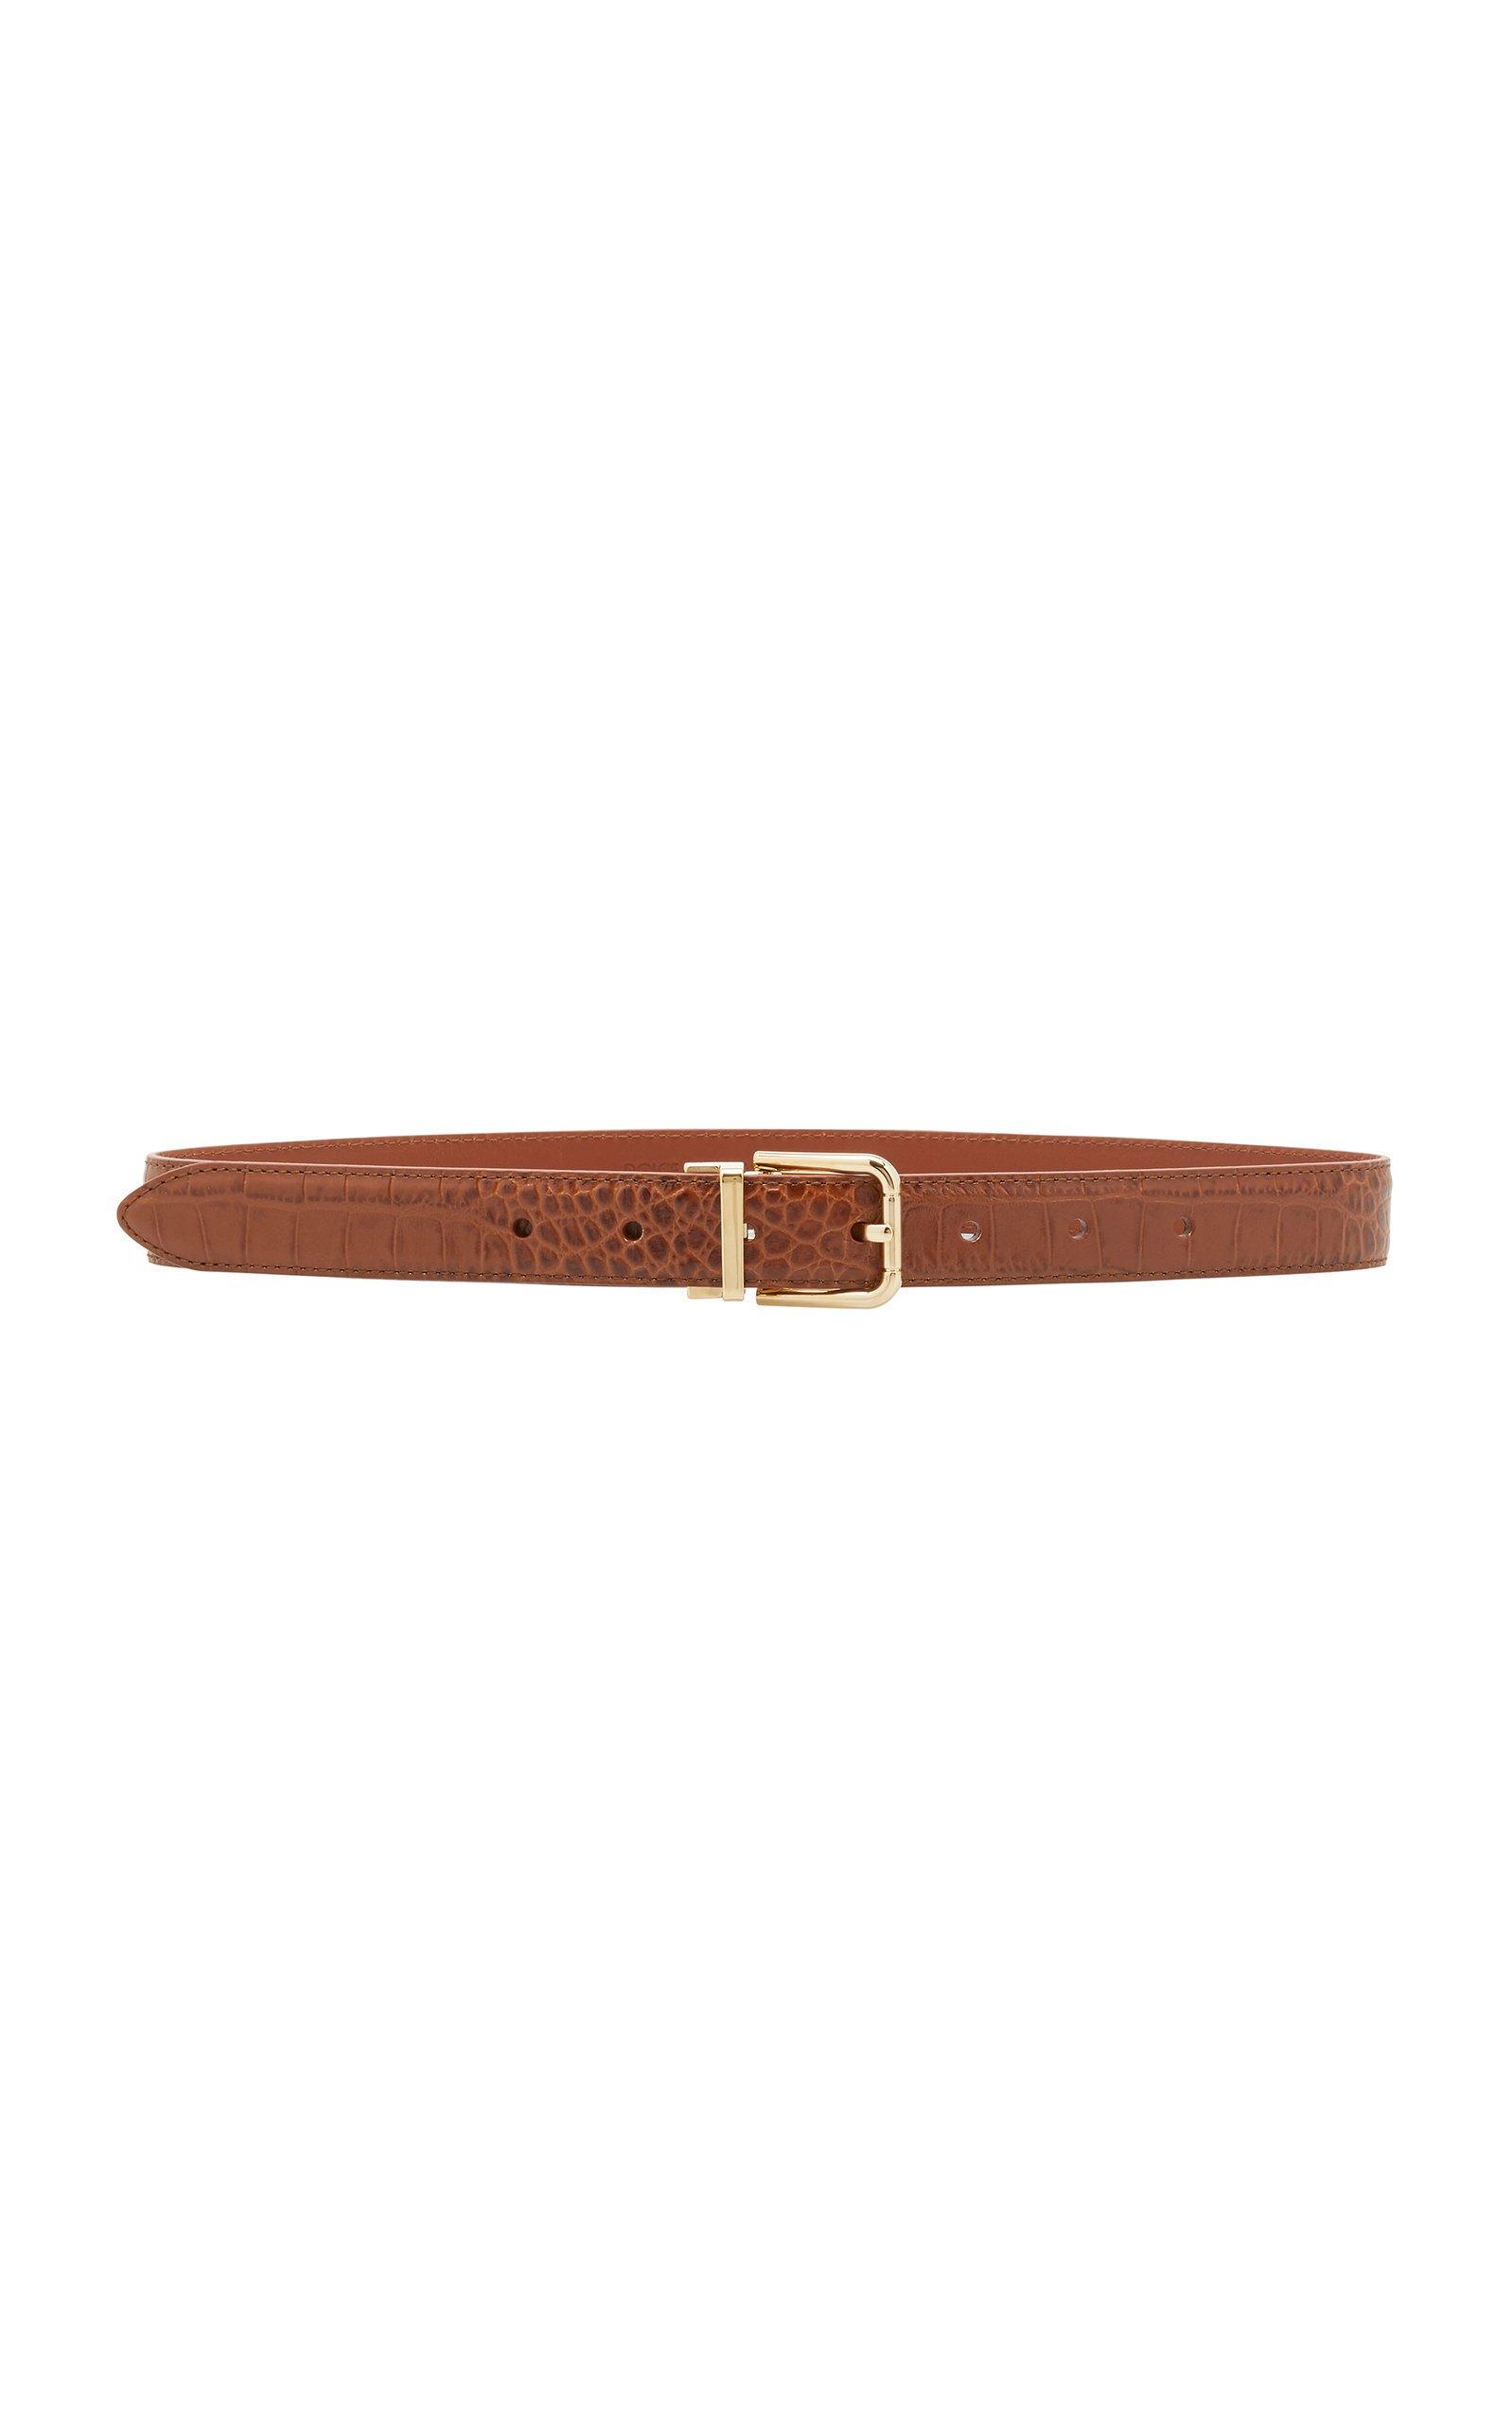 Dolce & Gabbana Croc-Effect Leather Belt Size: 95 cm